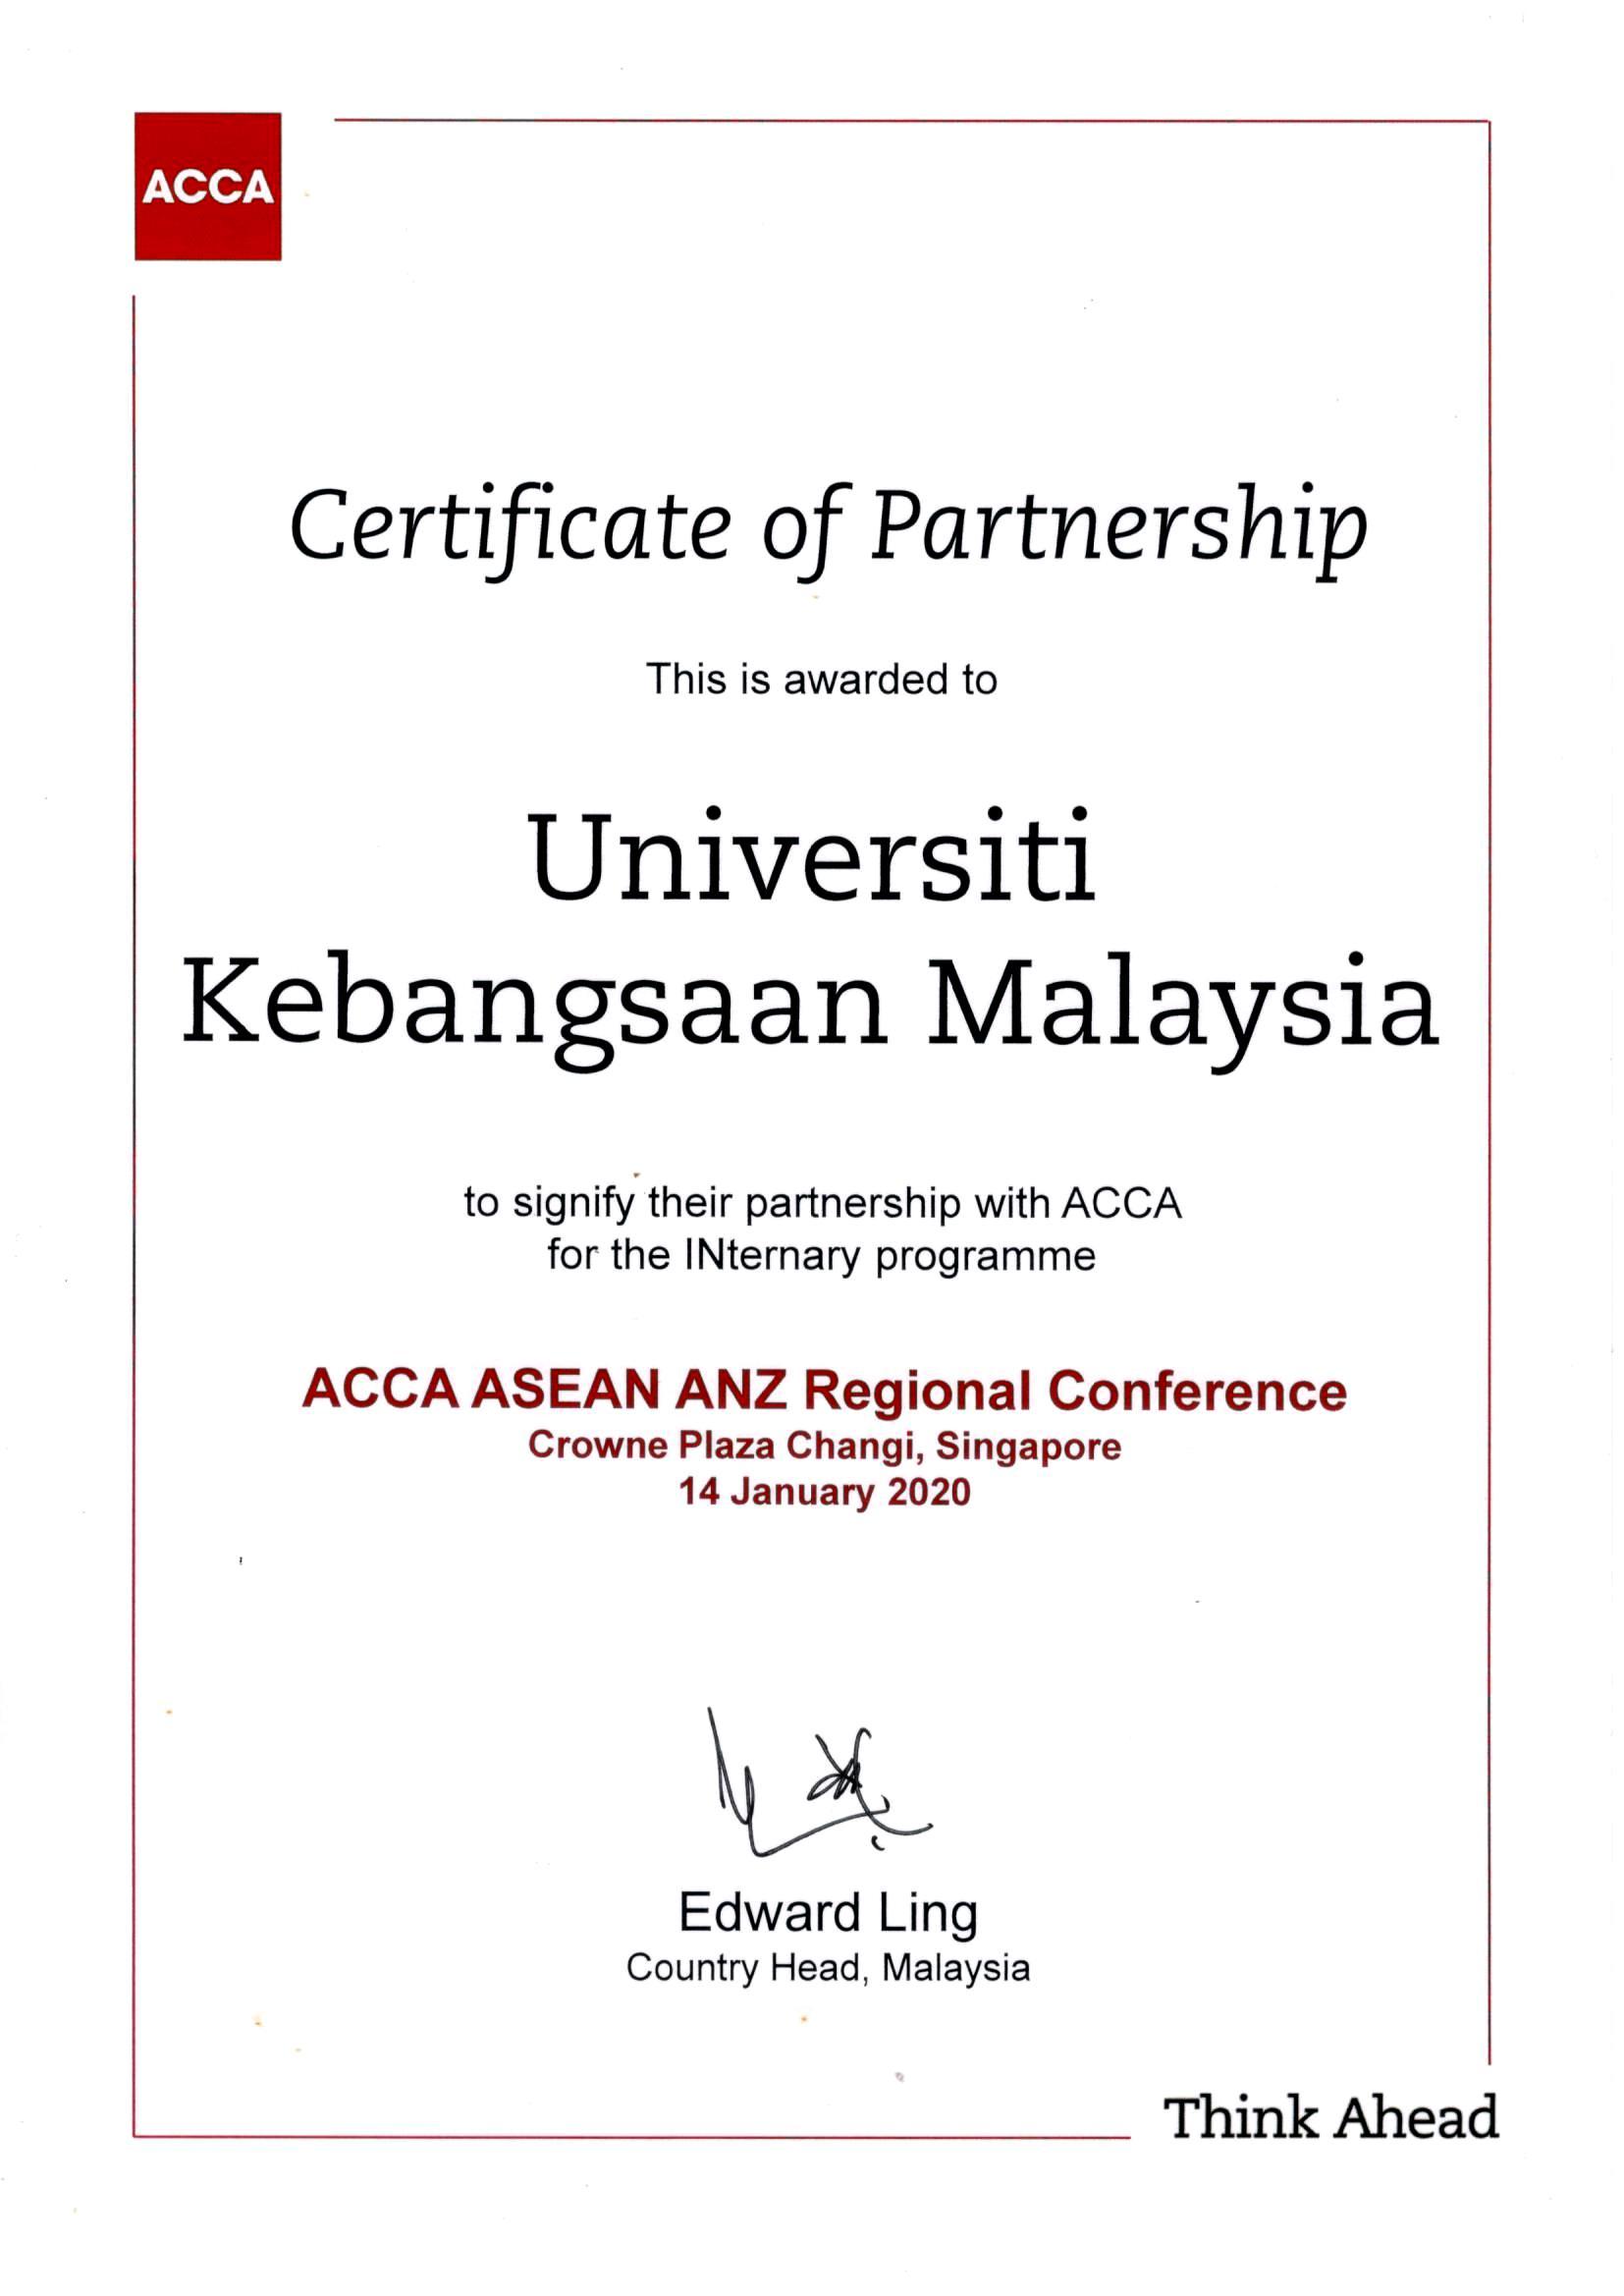 sijil acca